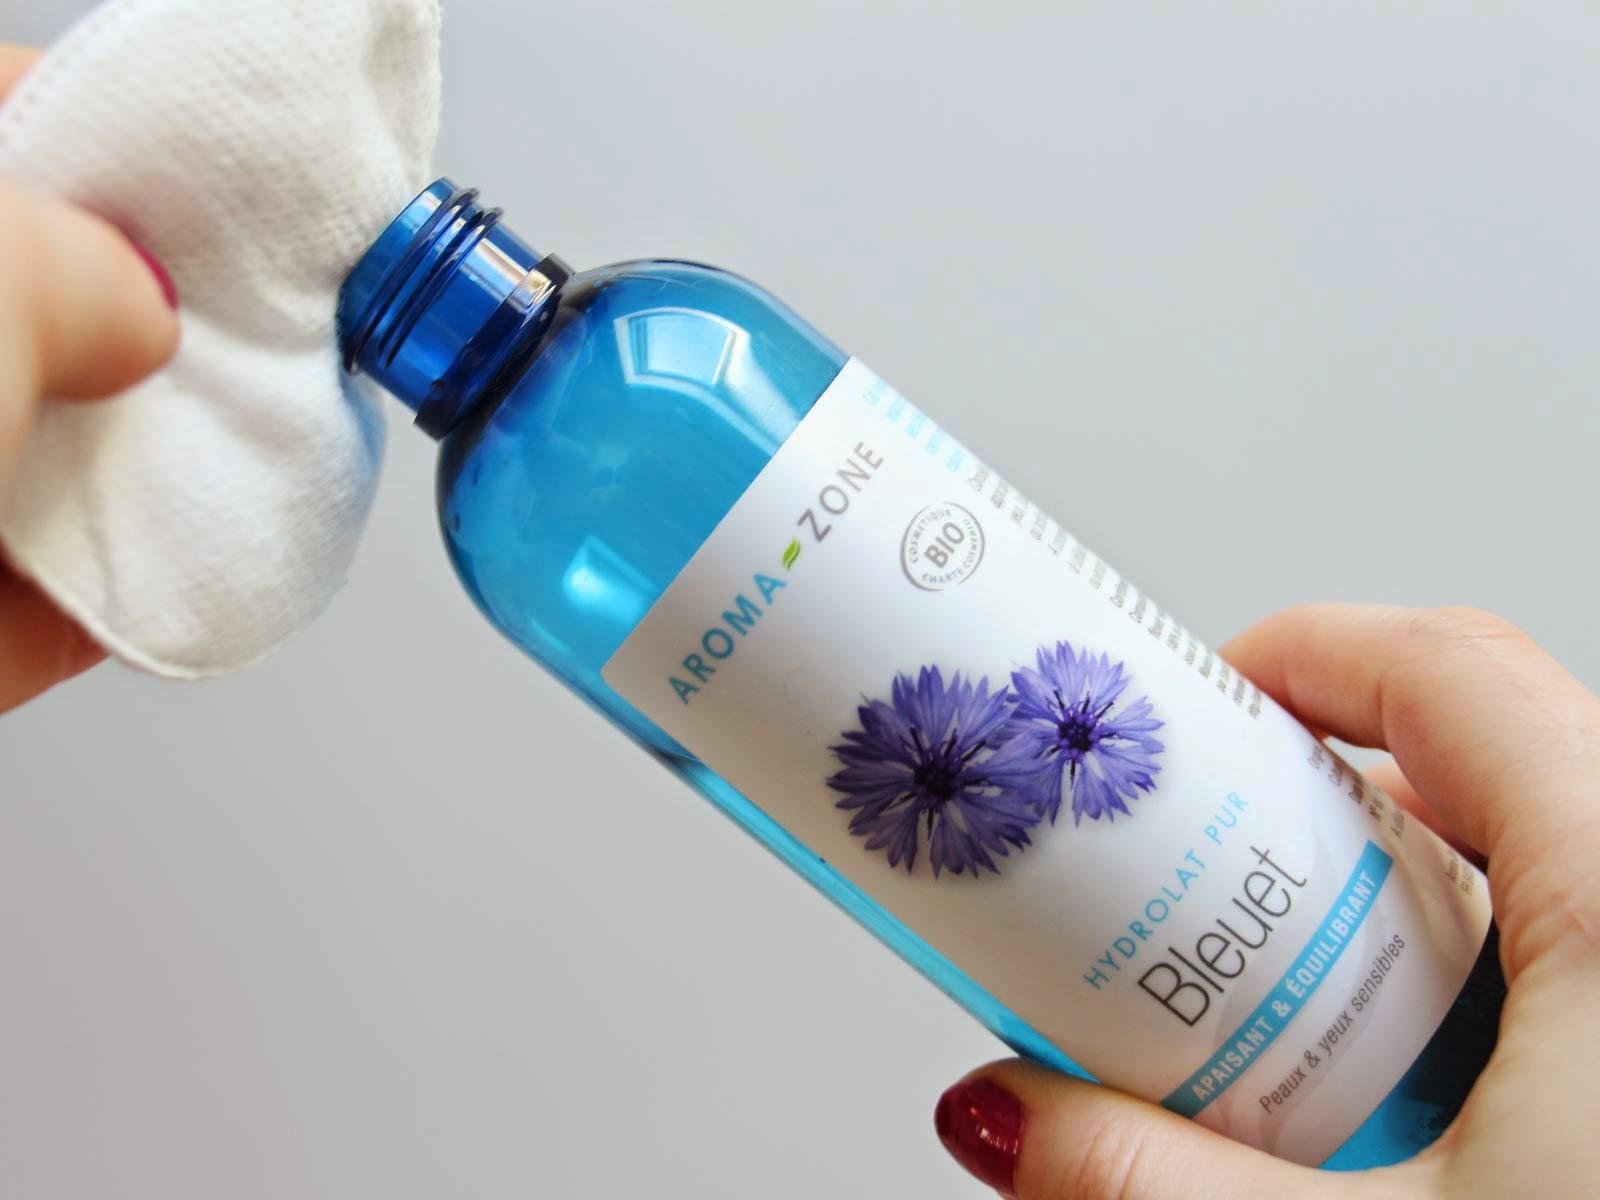 hydrolat bleuet aromazone